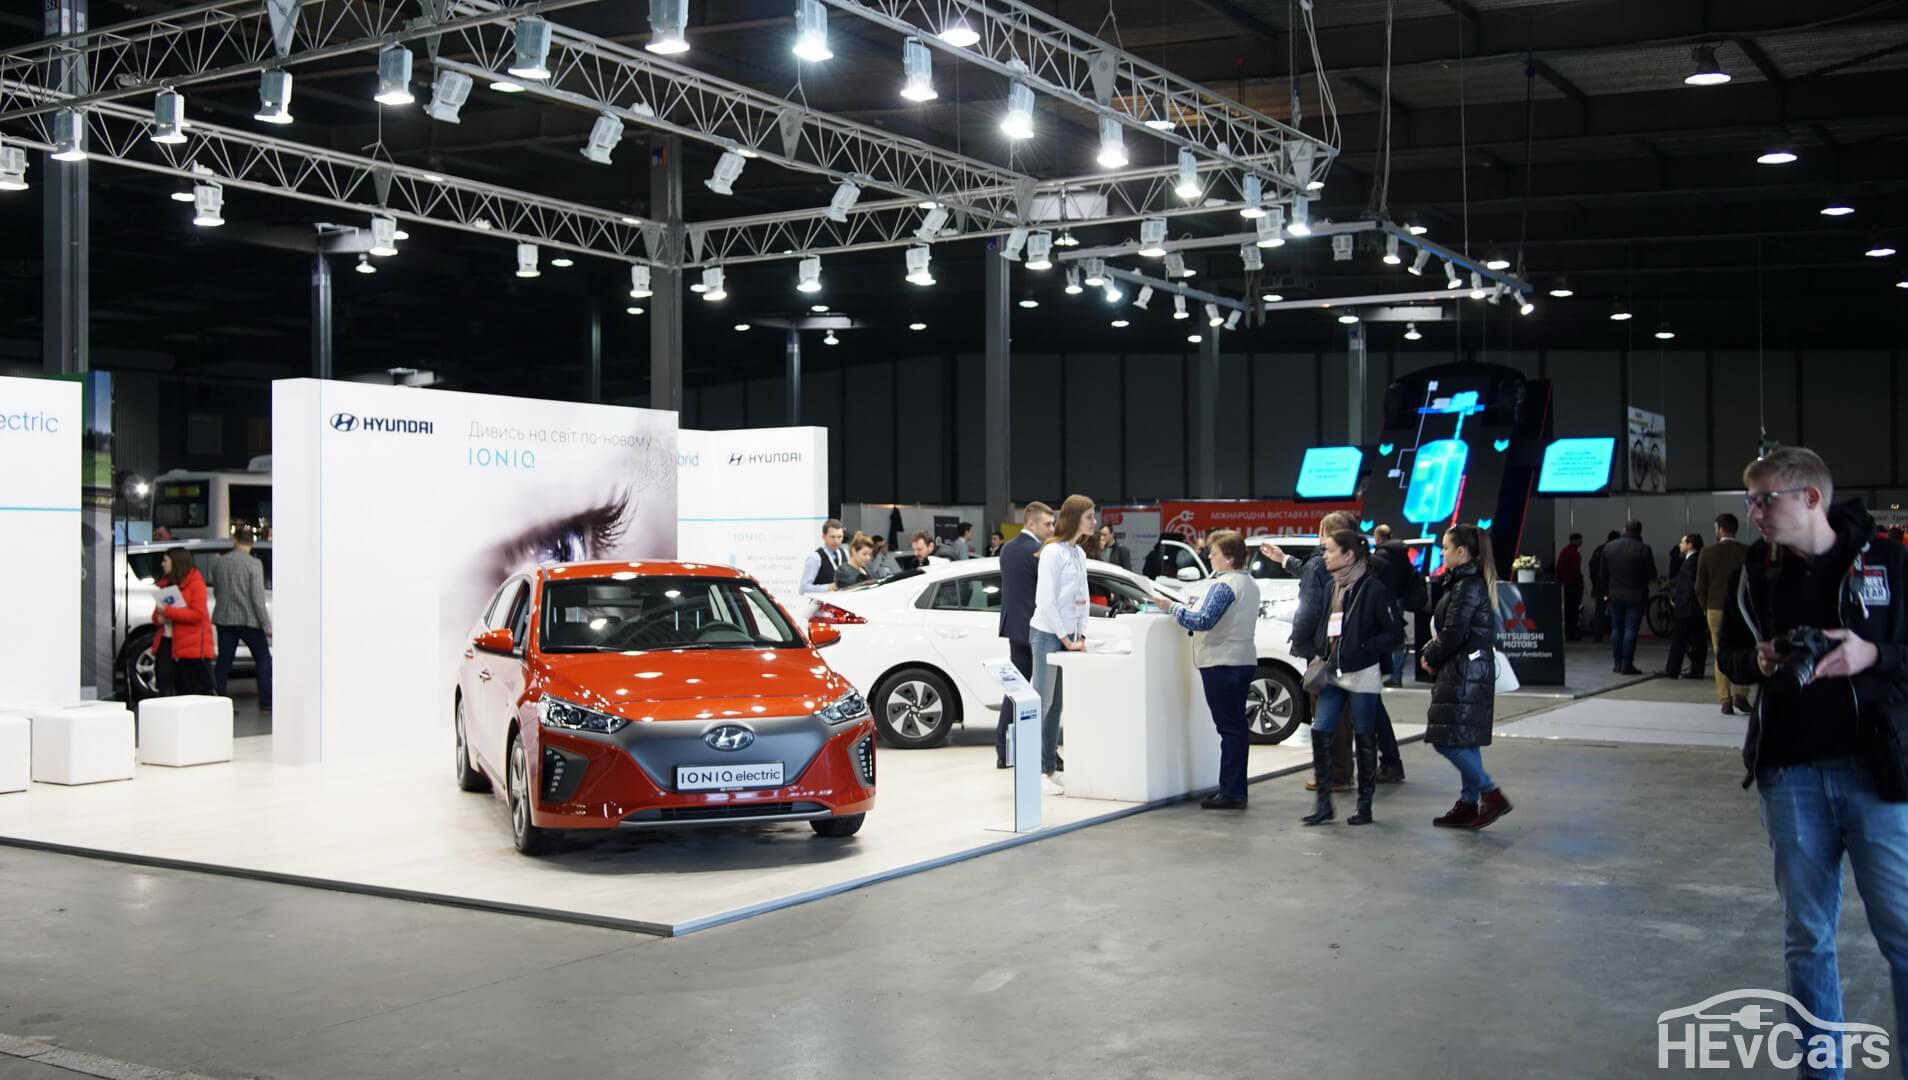 Электрокары Hyundai Ioniq Hybrid и Electric на Plug-In Ukraine 2018